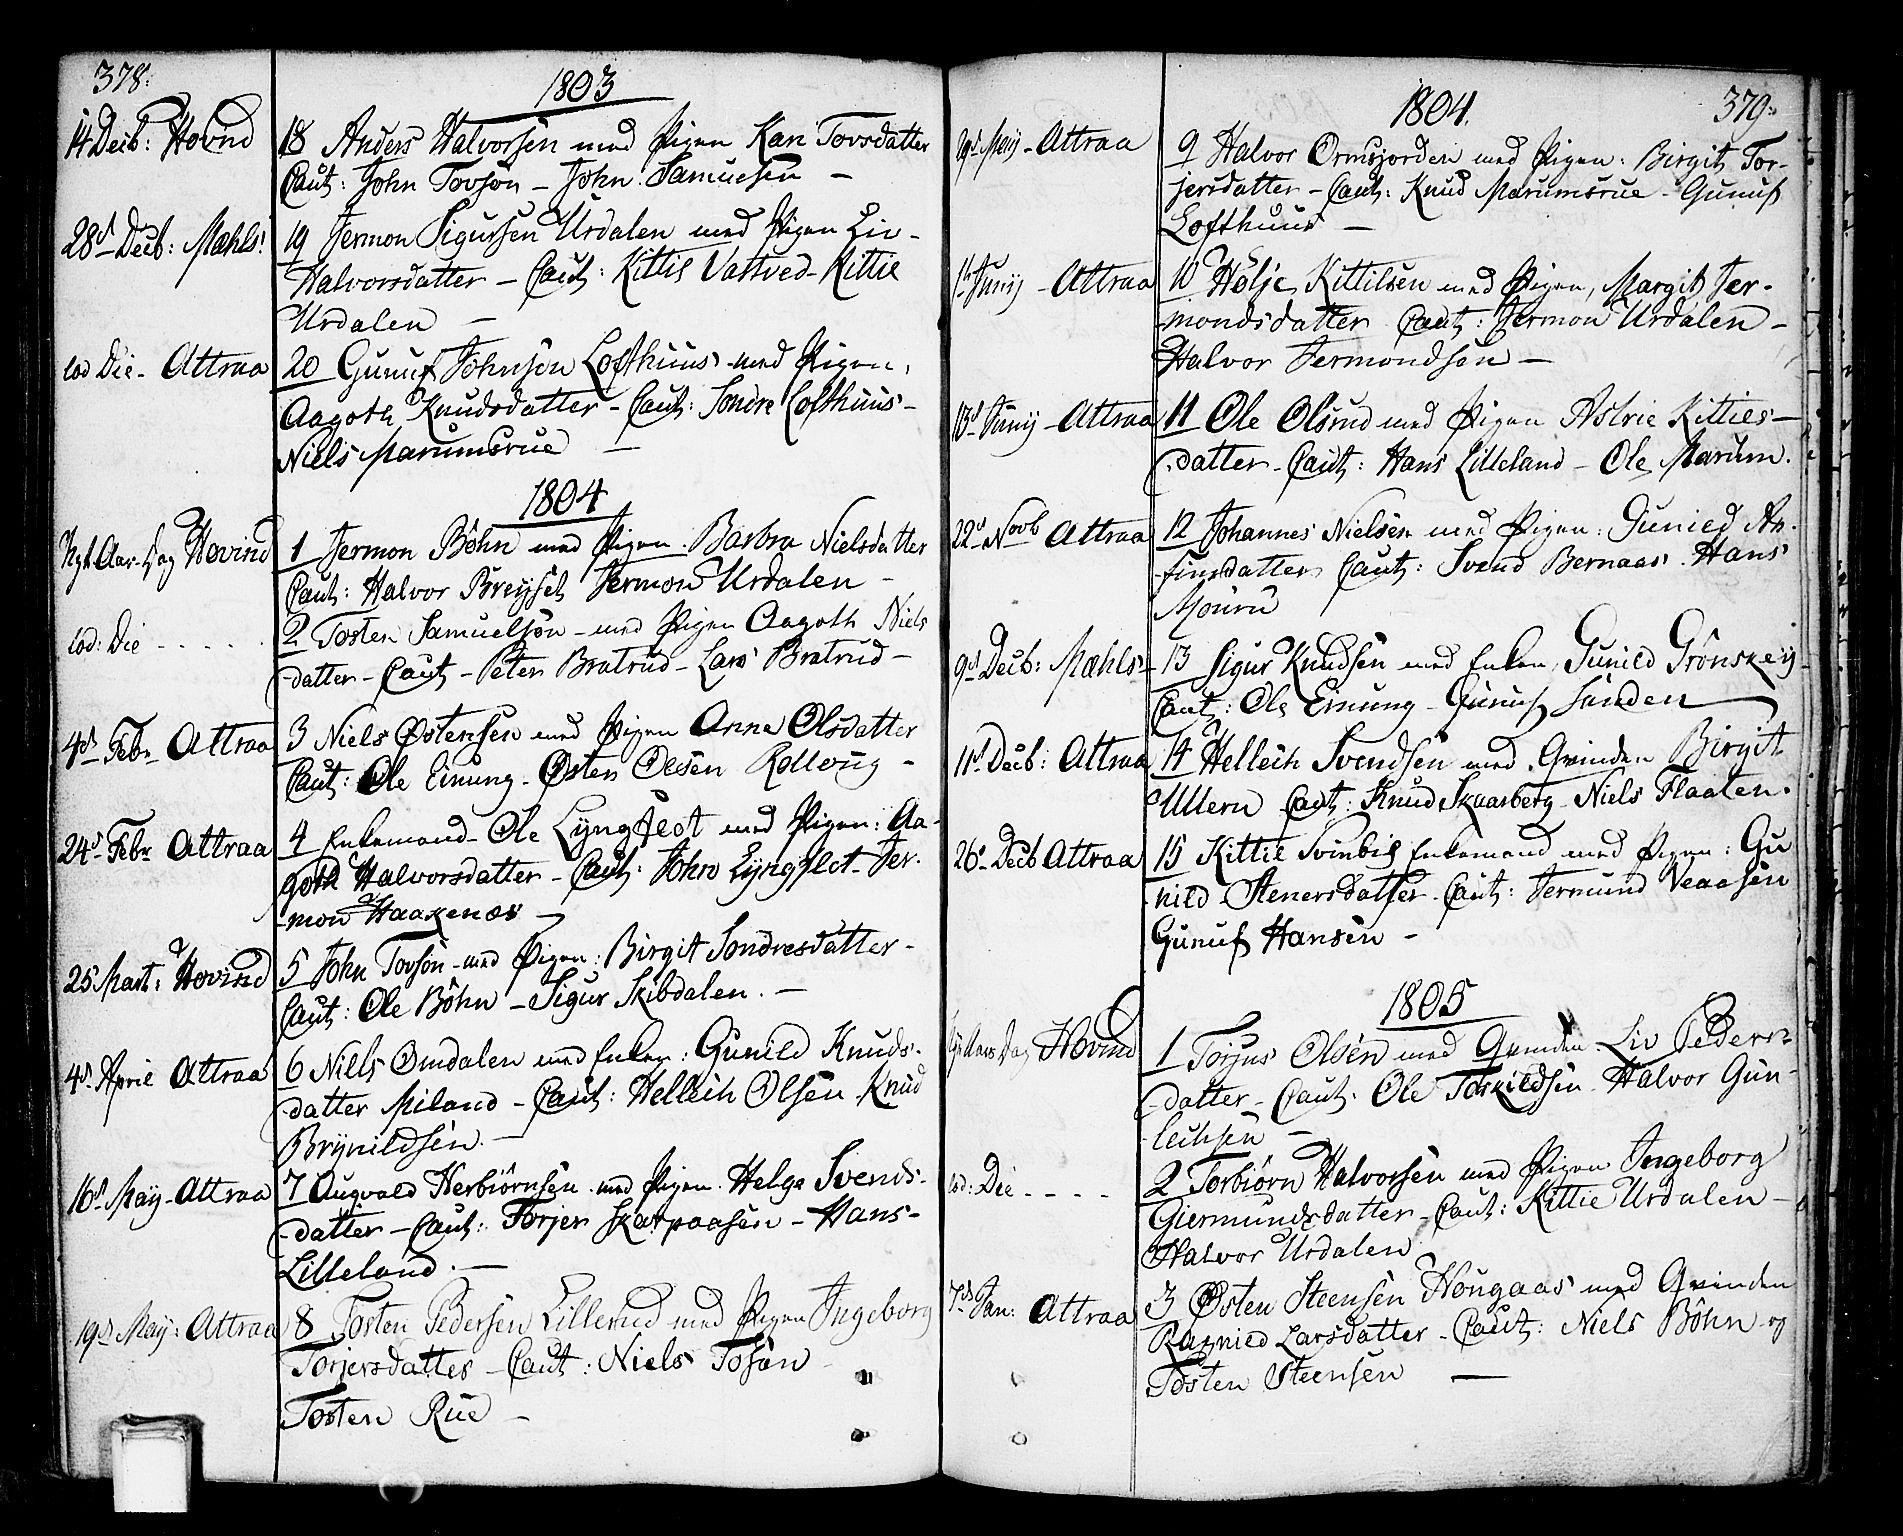 SAKO, Tinn kirkebøker, F/Fa/L0002: Ministerialbok nr. I 2, 1757-1810, s. 378-379